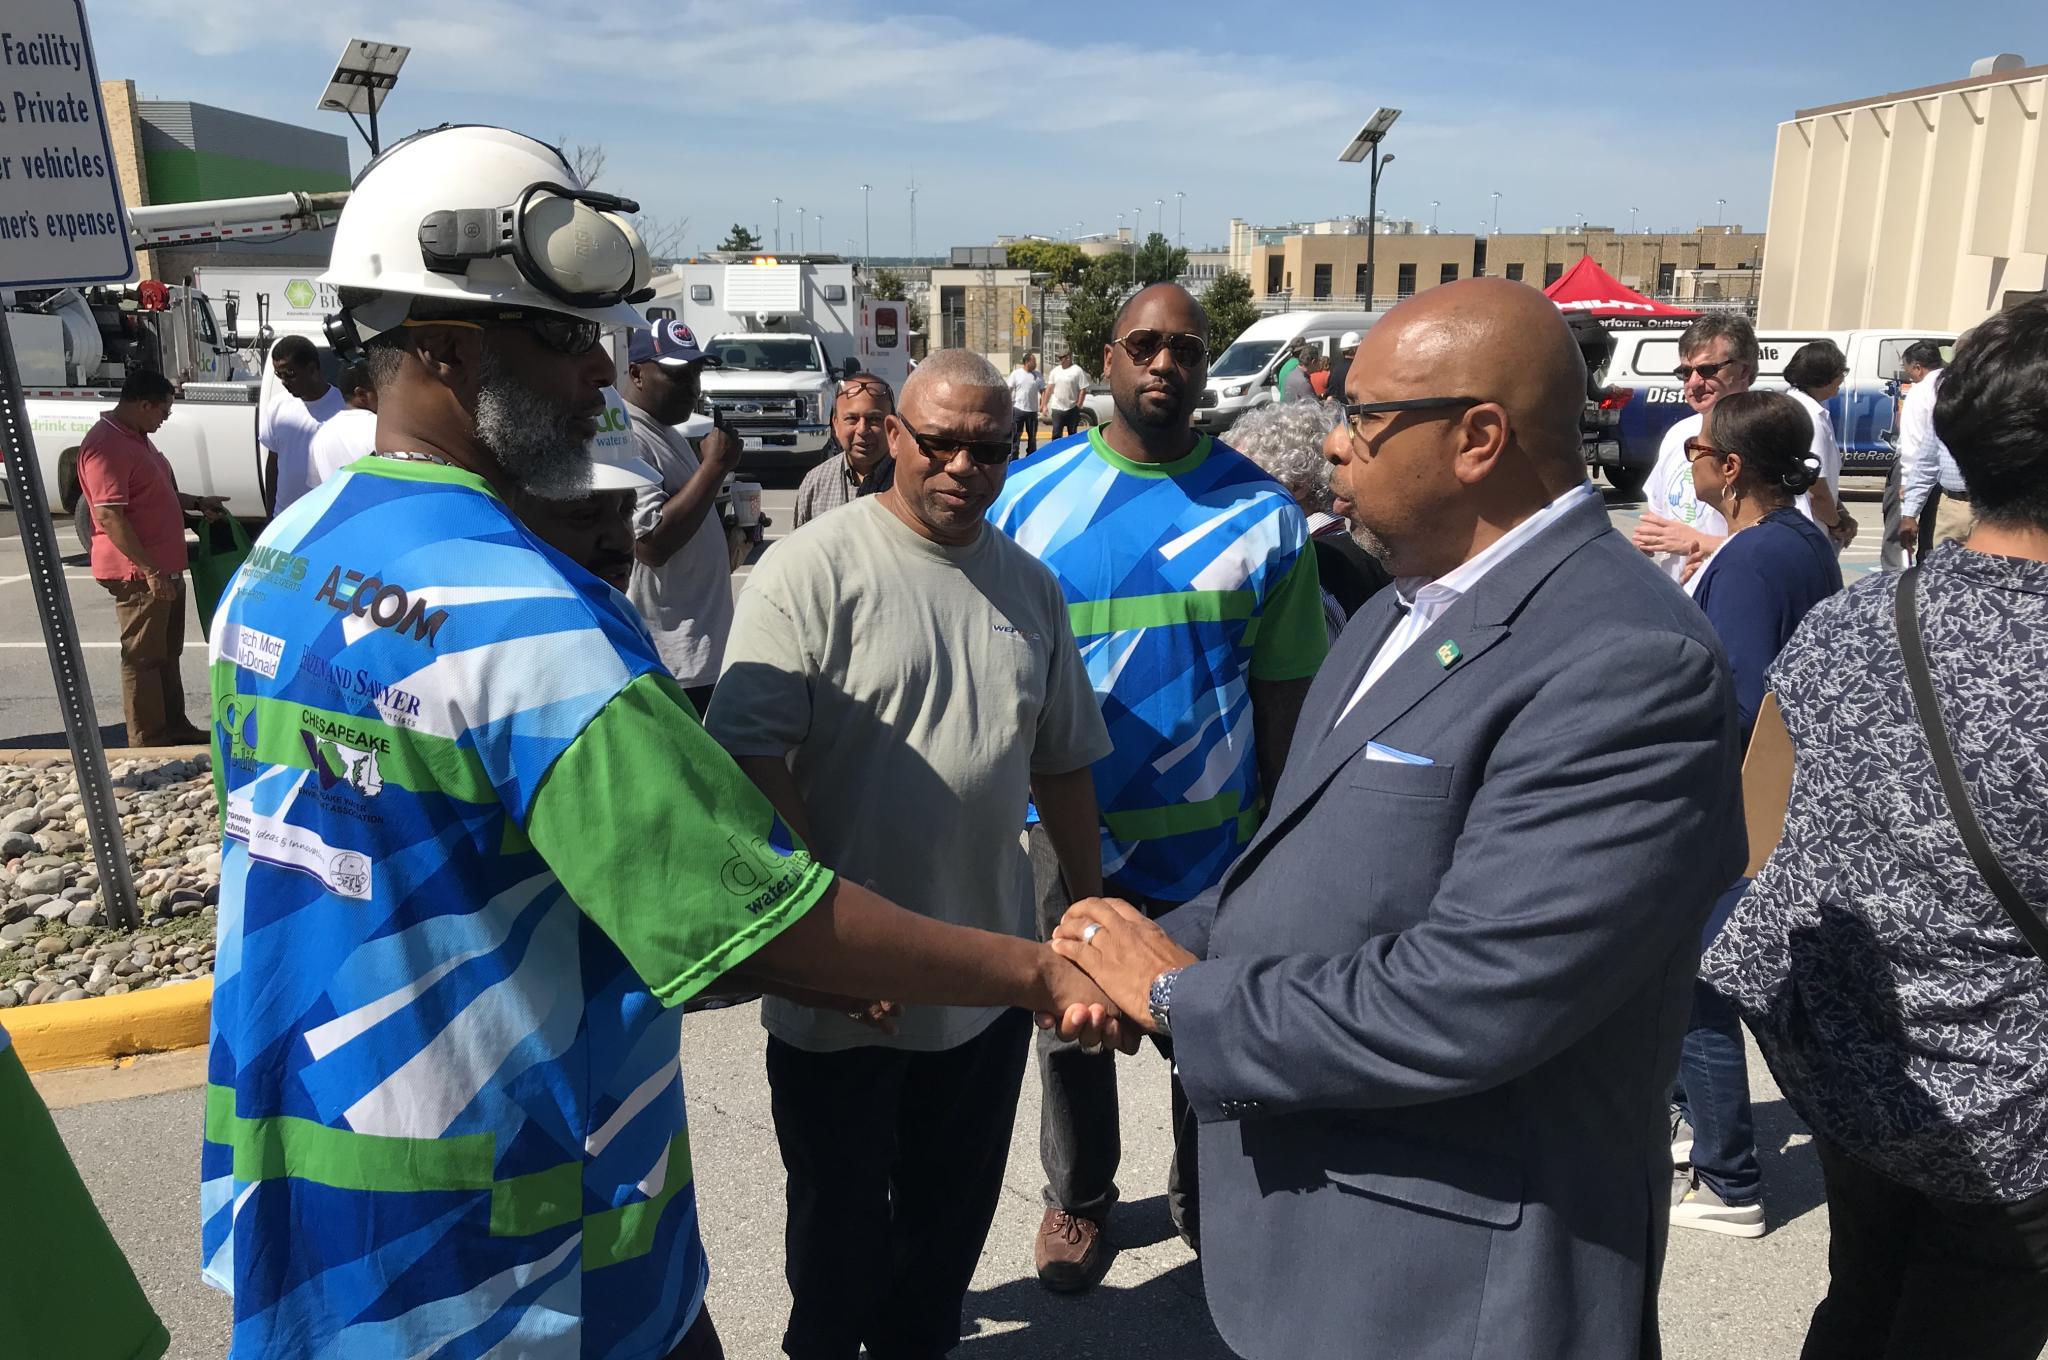 David Gadis meets DC Water employees